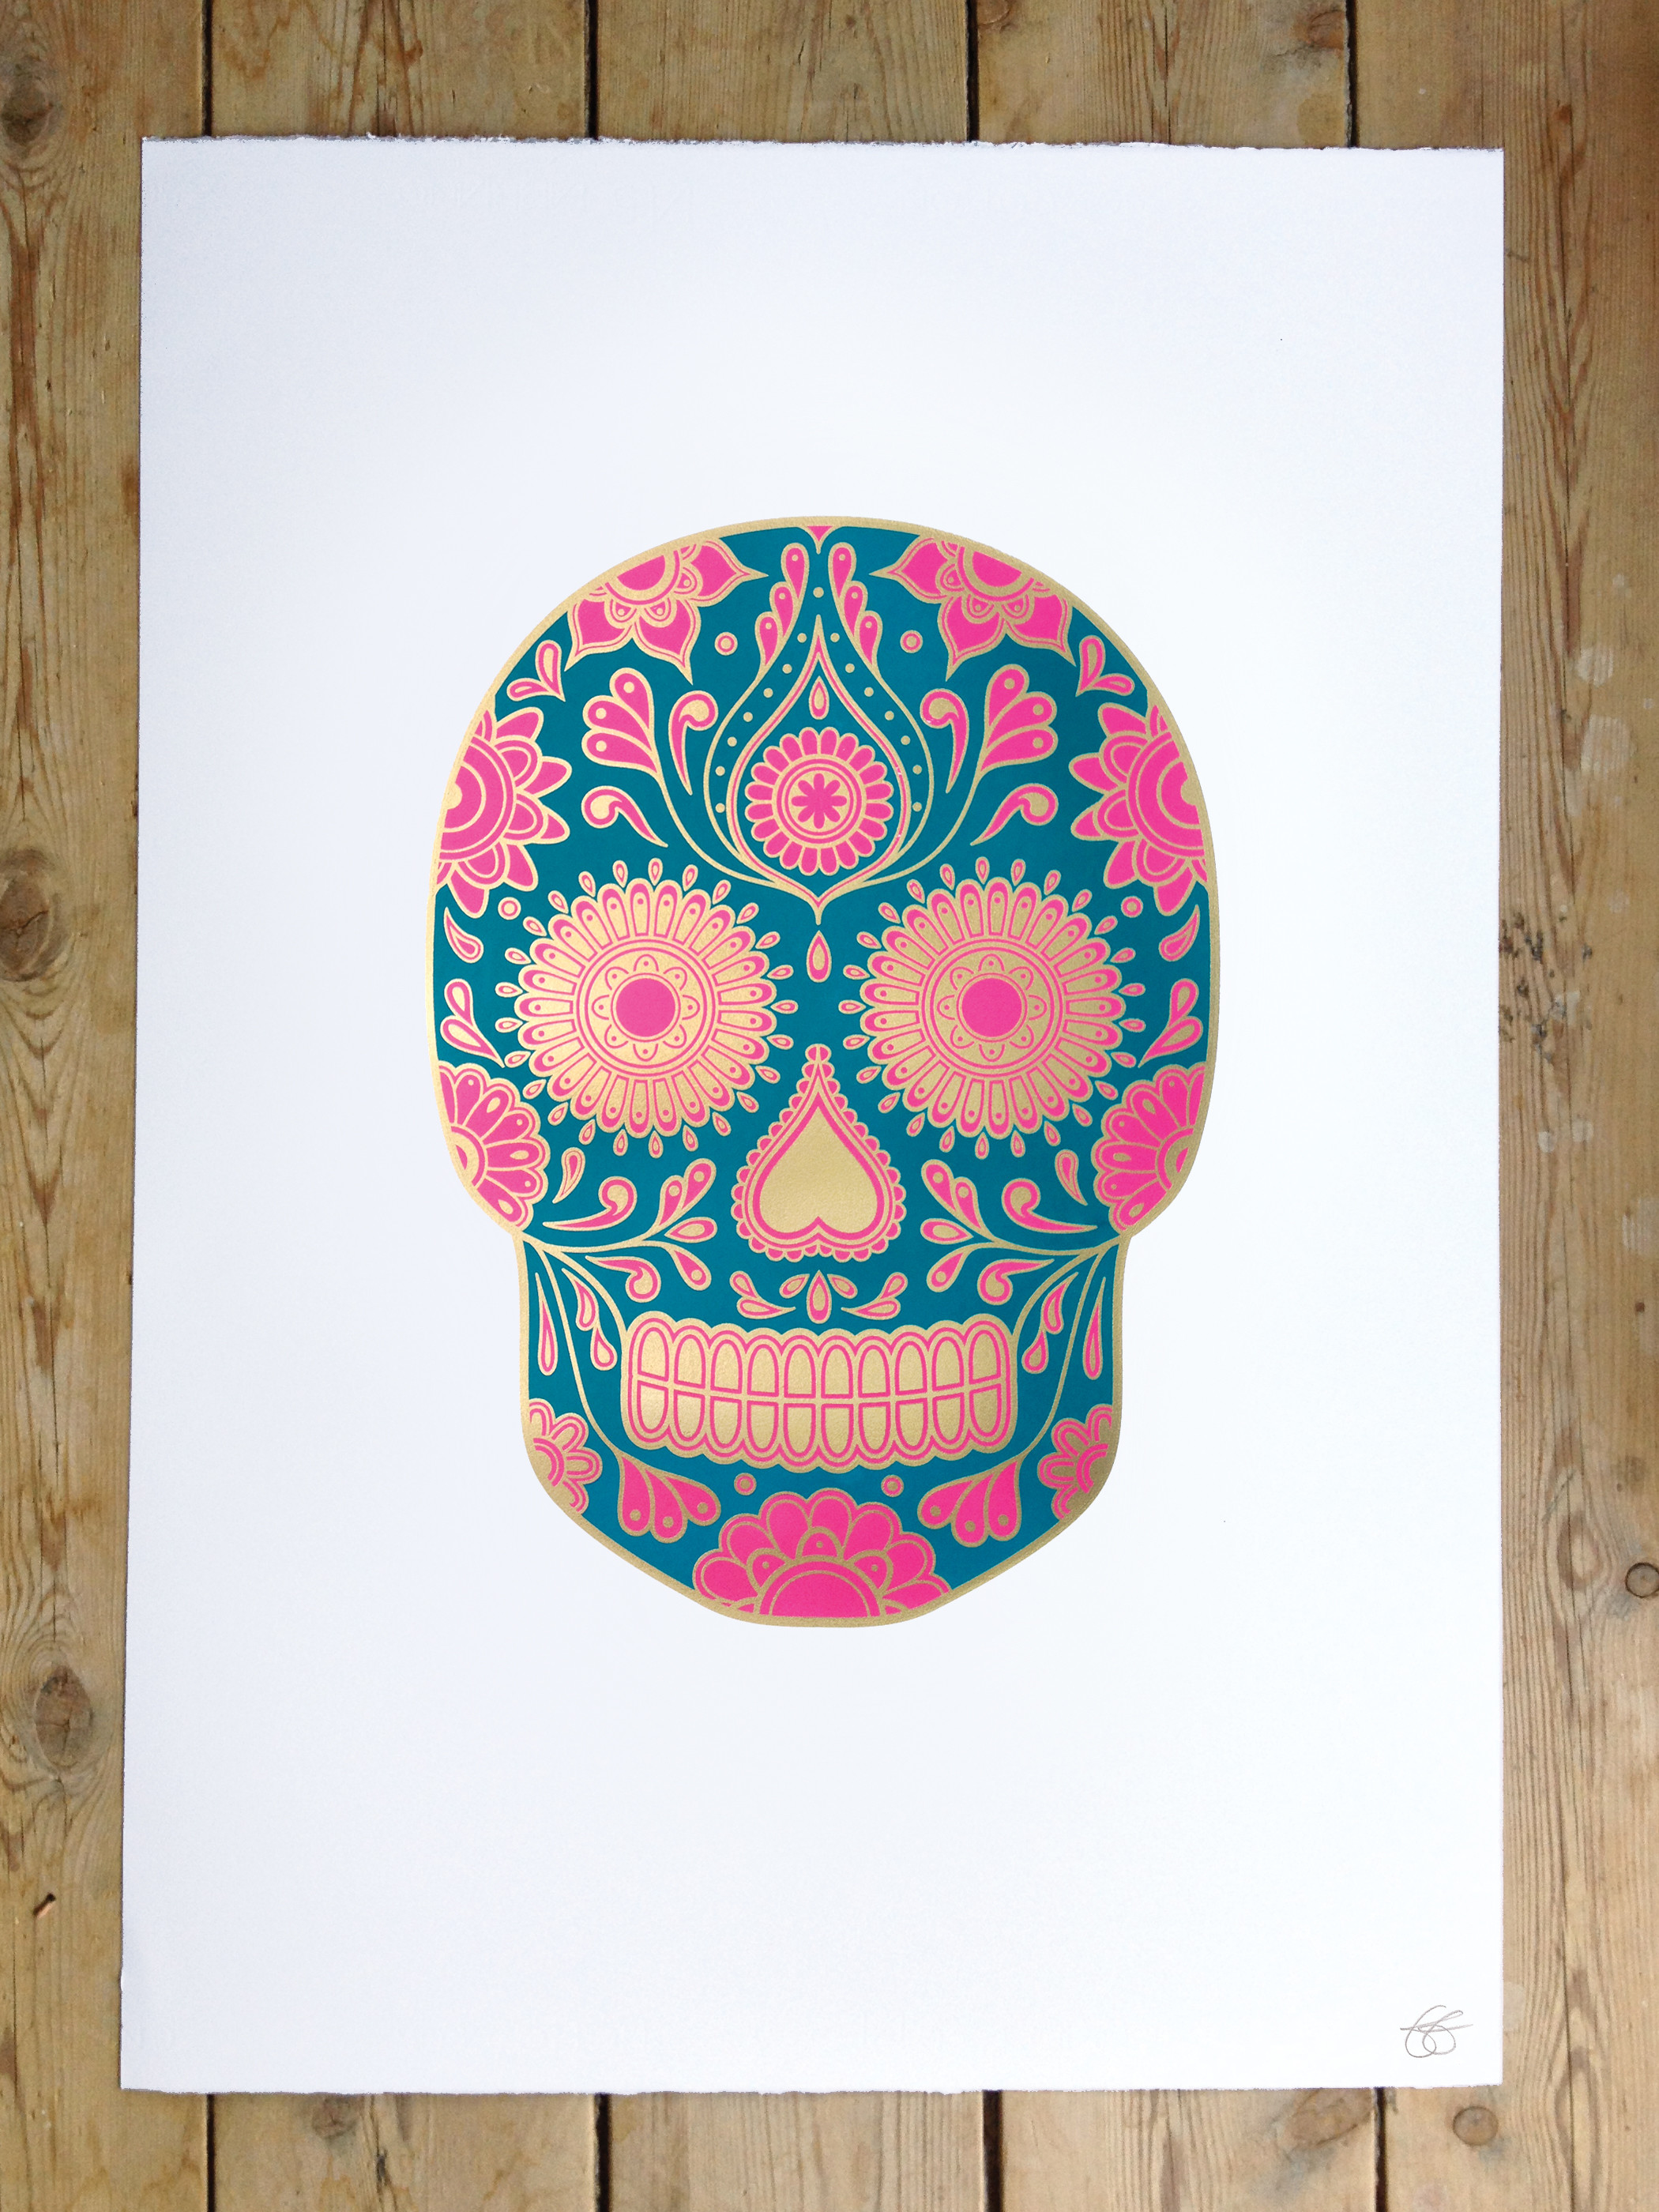 Girly skull wallpaper 58 images - Sugar skull background ...